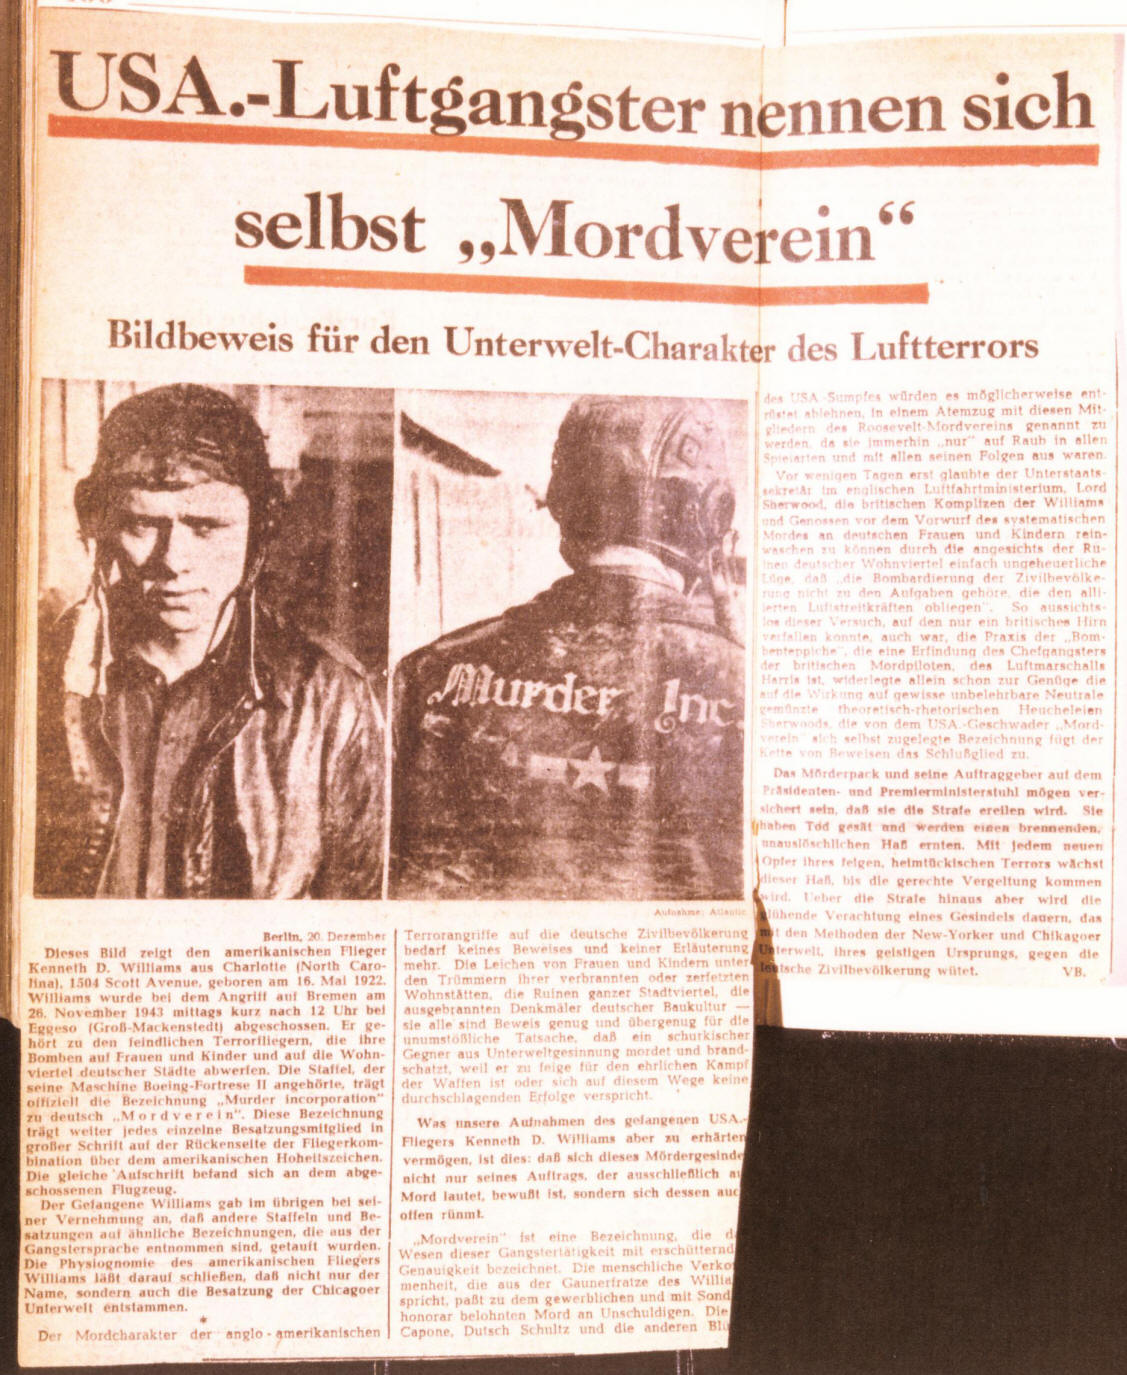 kenneth d williams murder inc wwii pow german newspaper article of murder inc